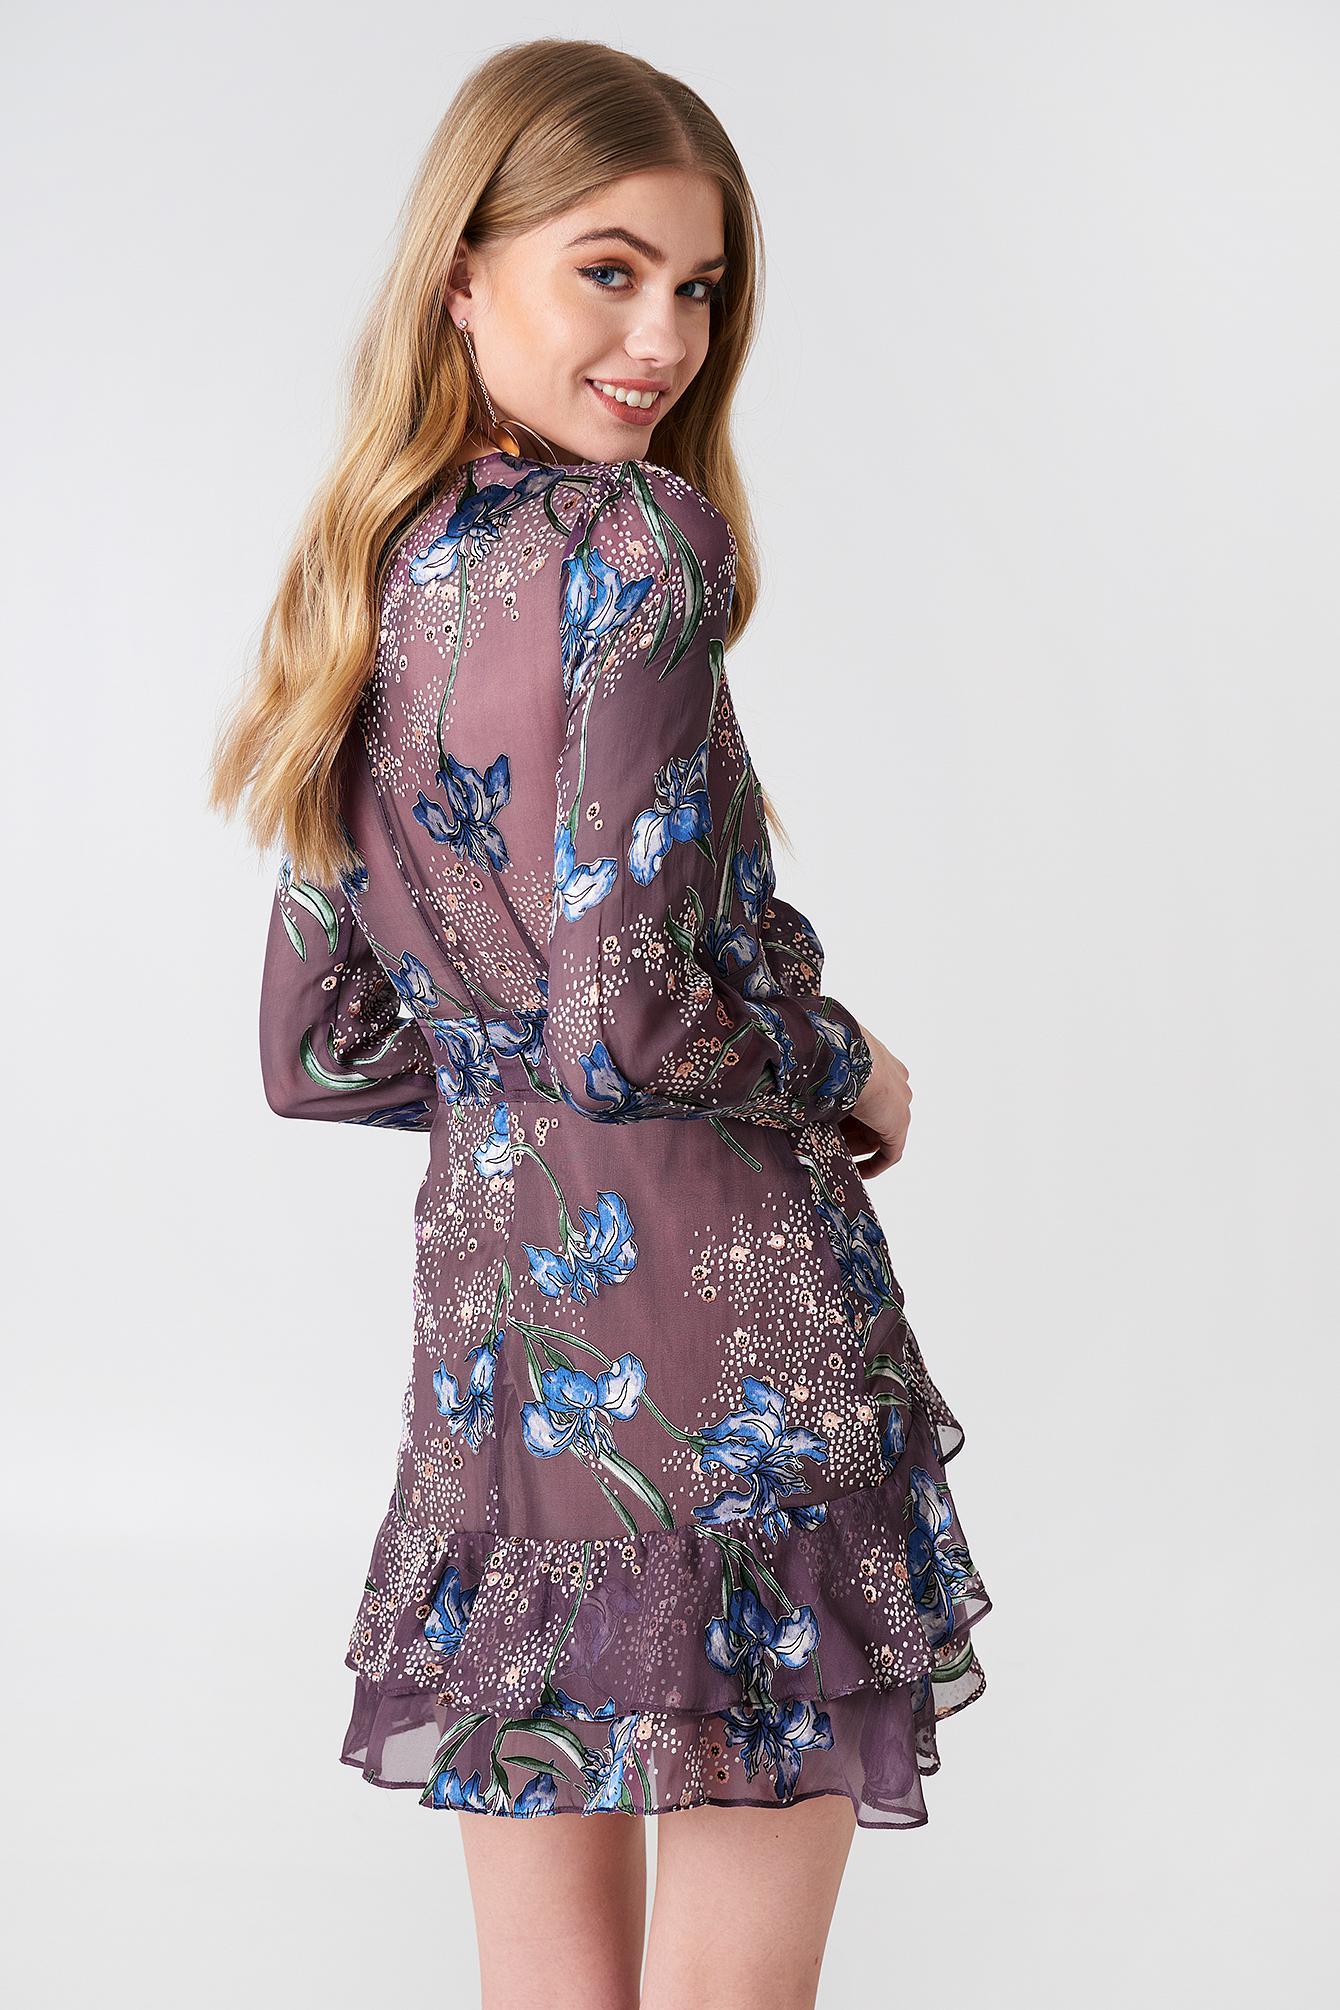 For Love and Lemons - Amelia Strapless Mini Dress   All